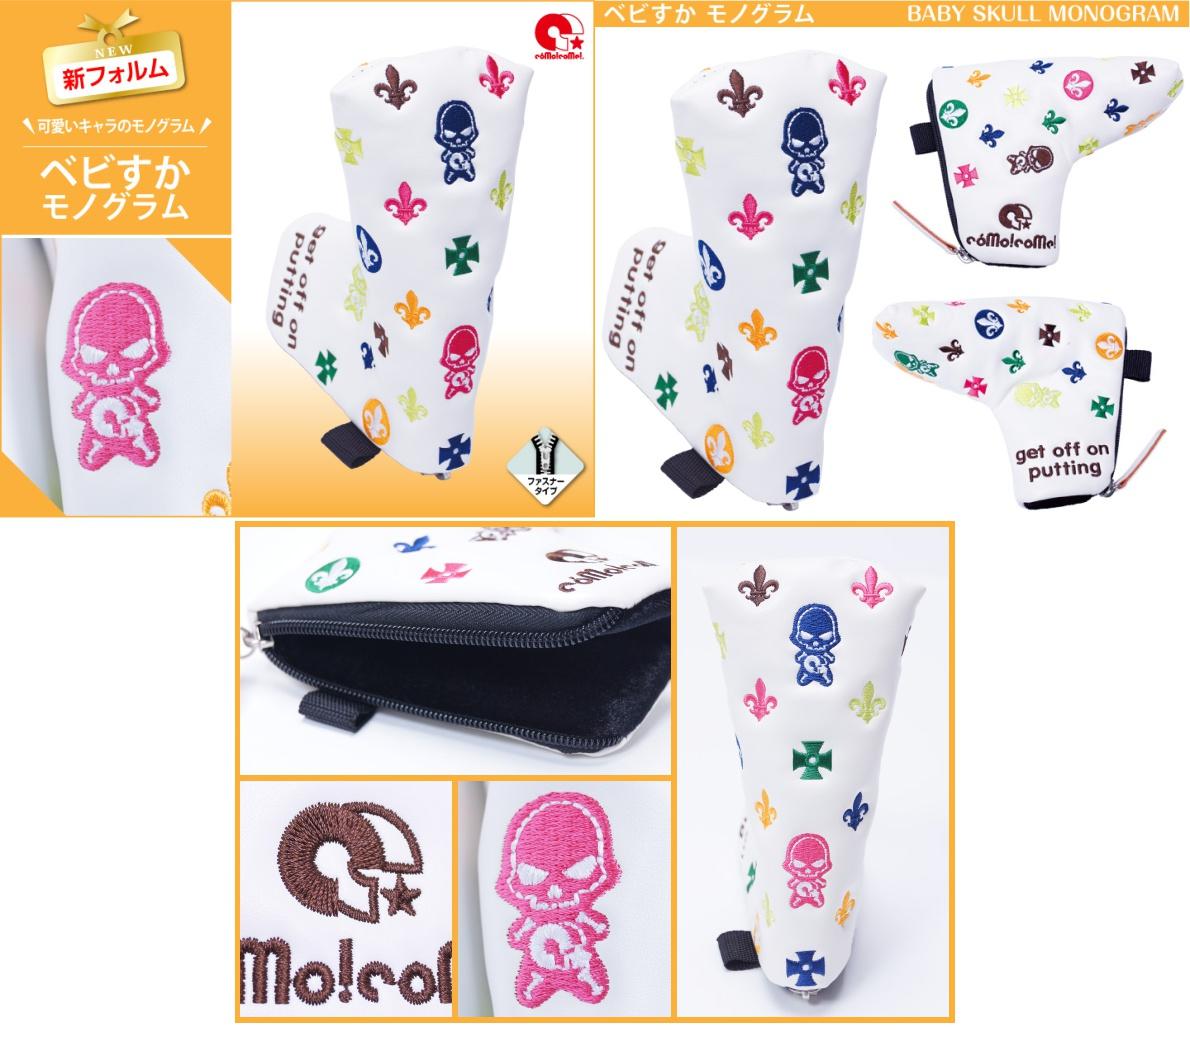 Como!Come! Baby Skull Blade Putter Cover